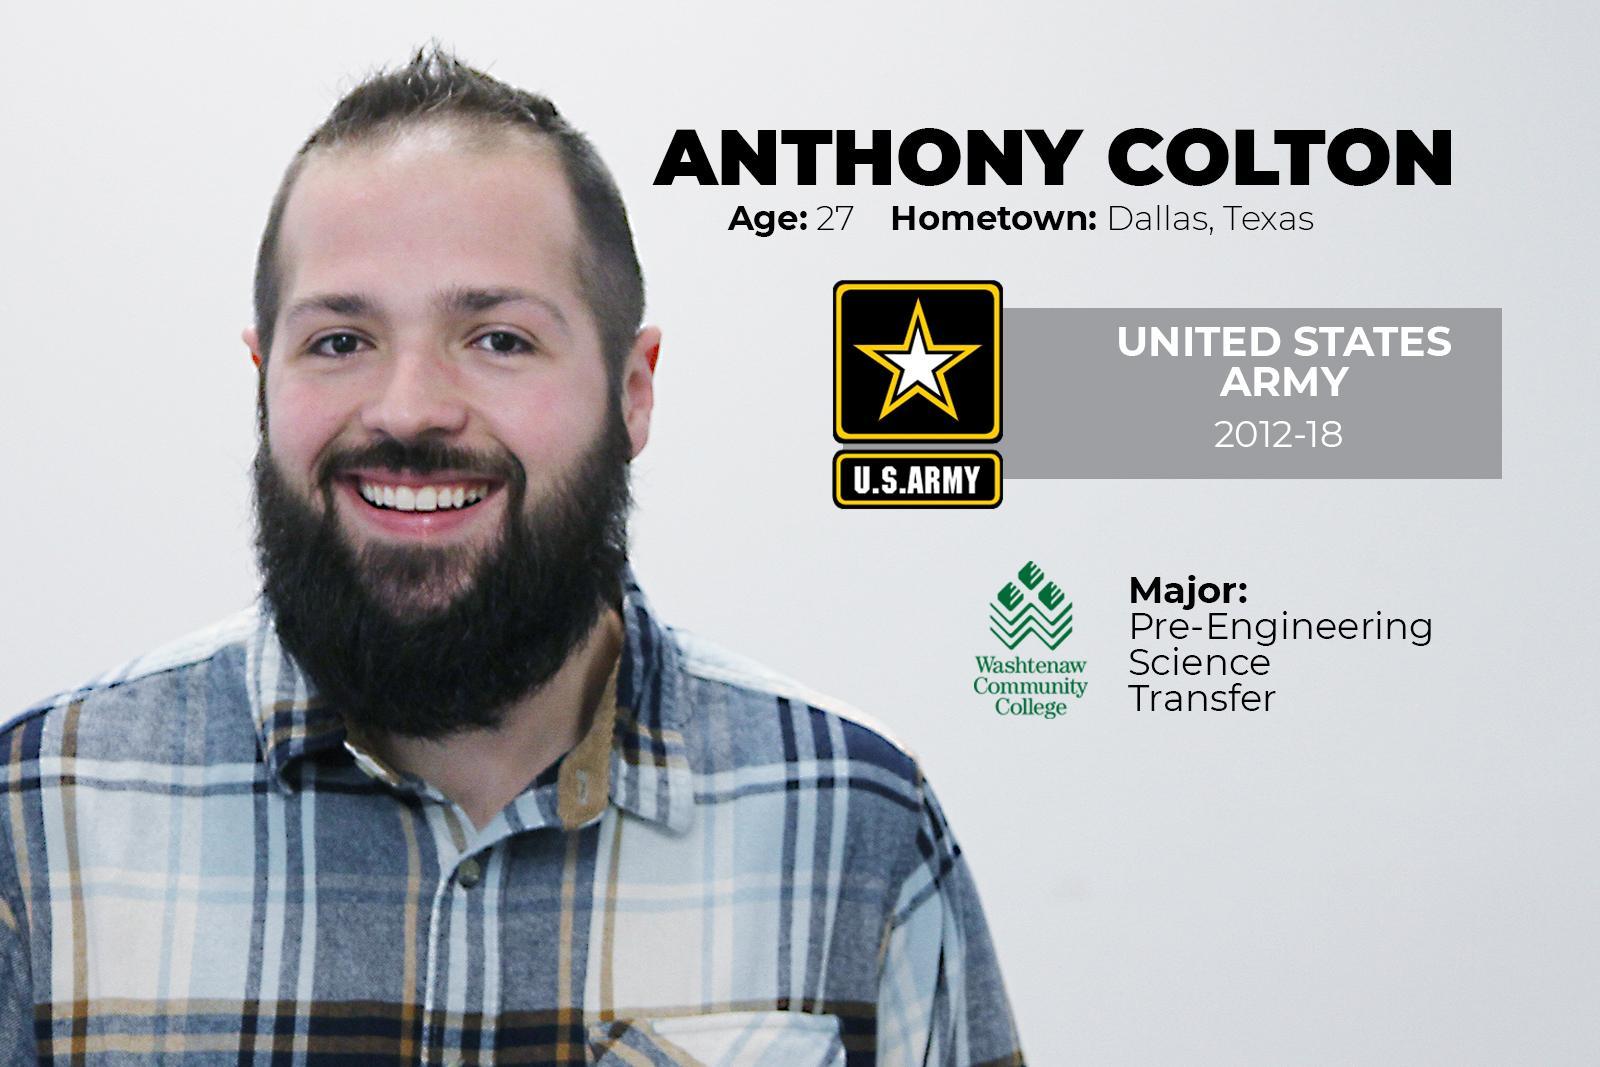 Anthony Colton